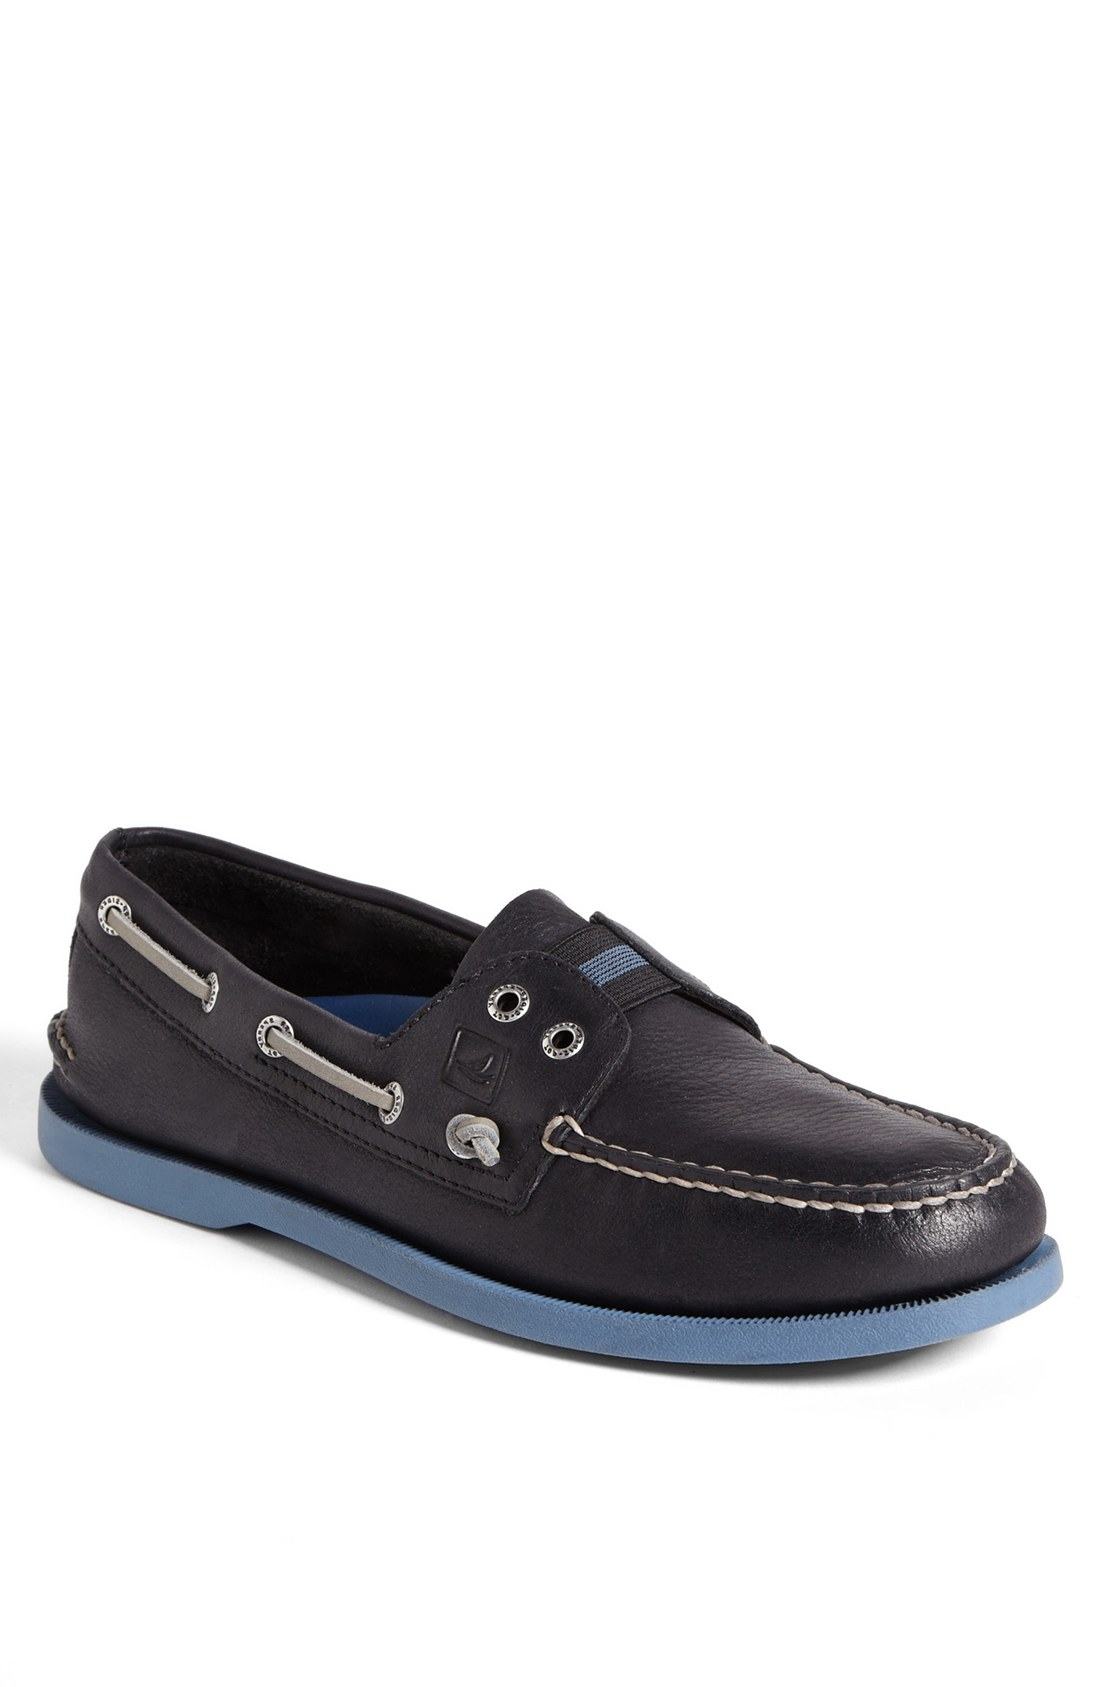 sperry top sider slipon boat shoe in black for black